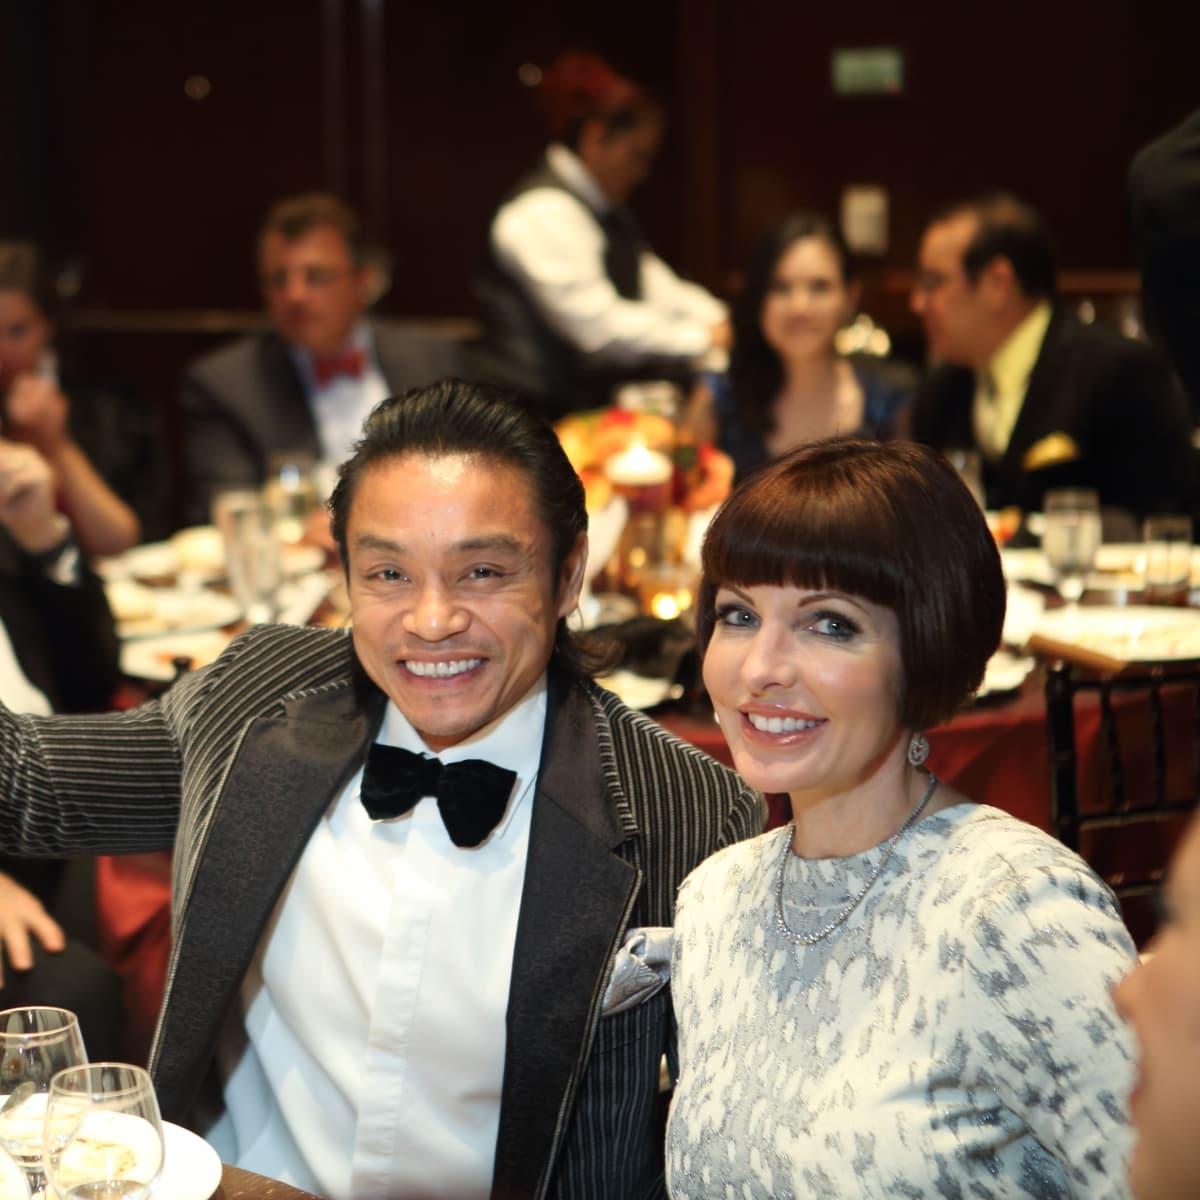 News, Shelby, Women's Home gala, Nov. 2015, Dr. Quang Henderson, Staci Henderson